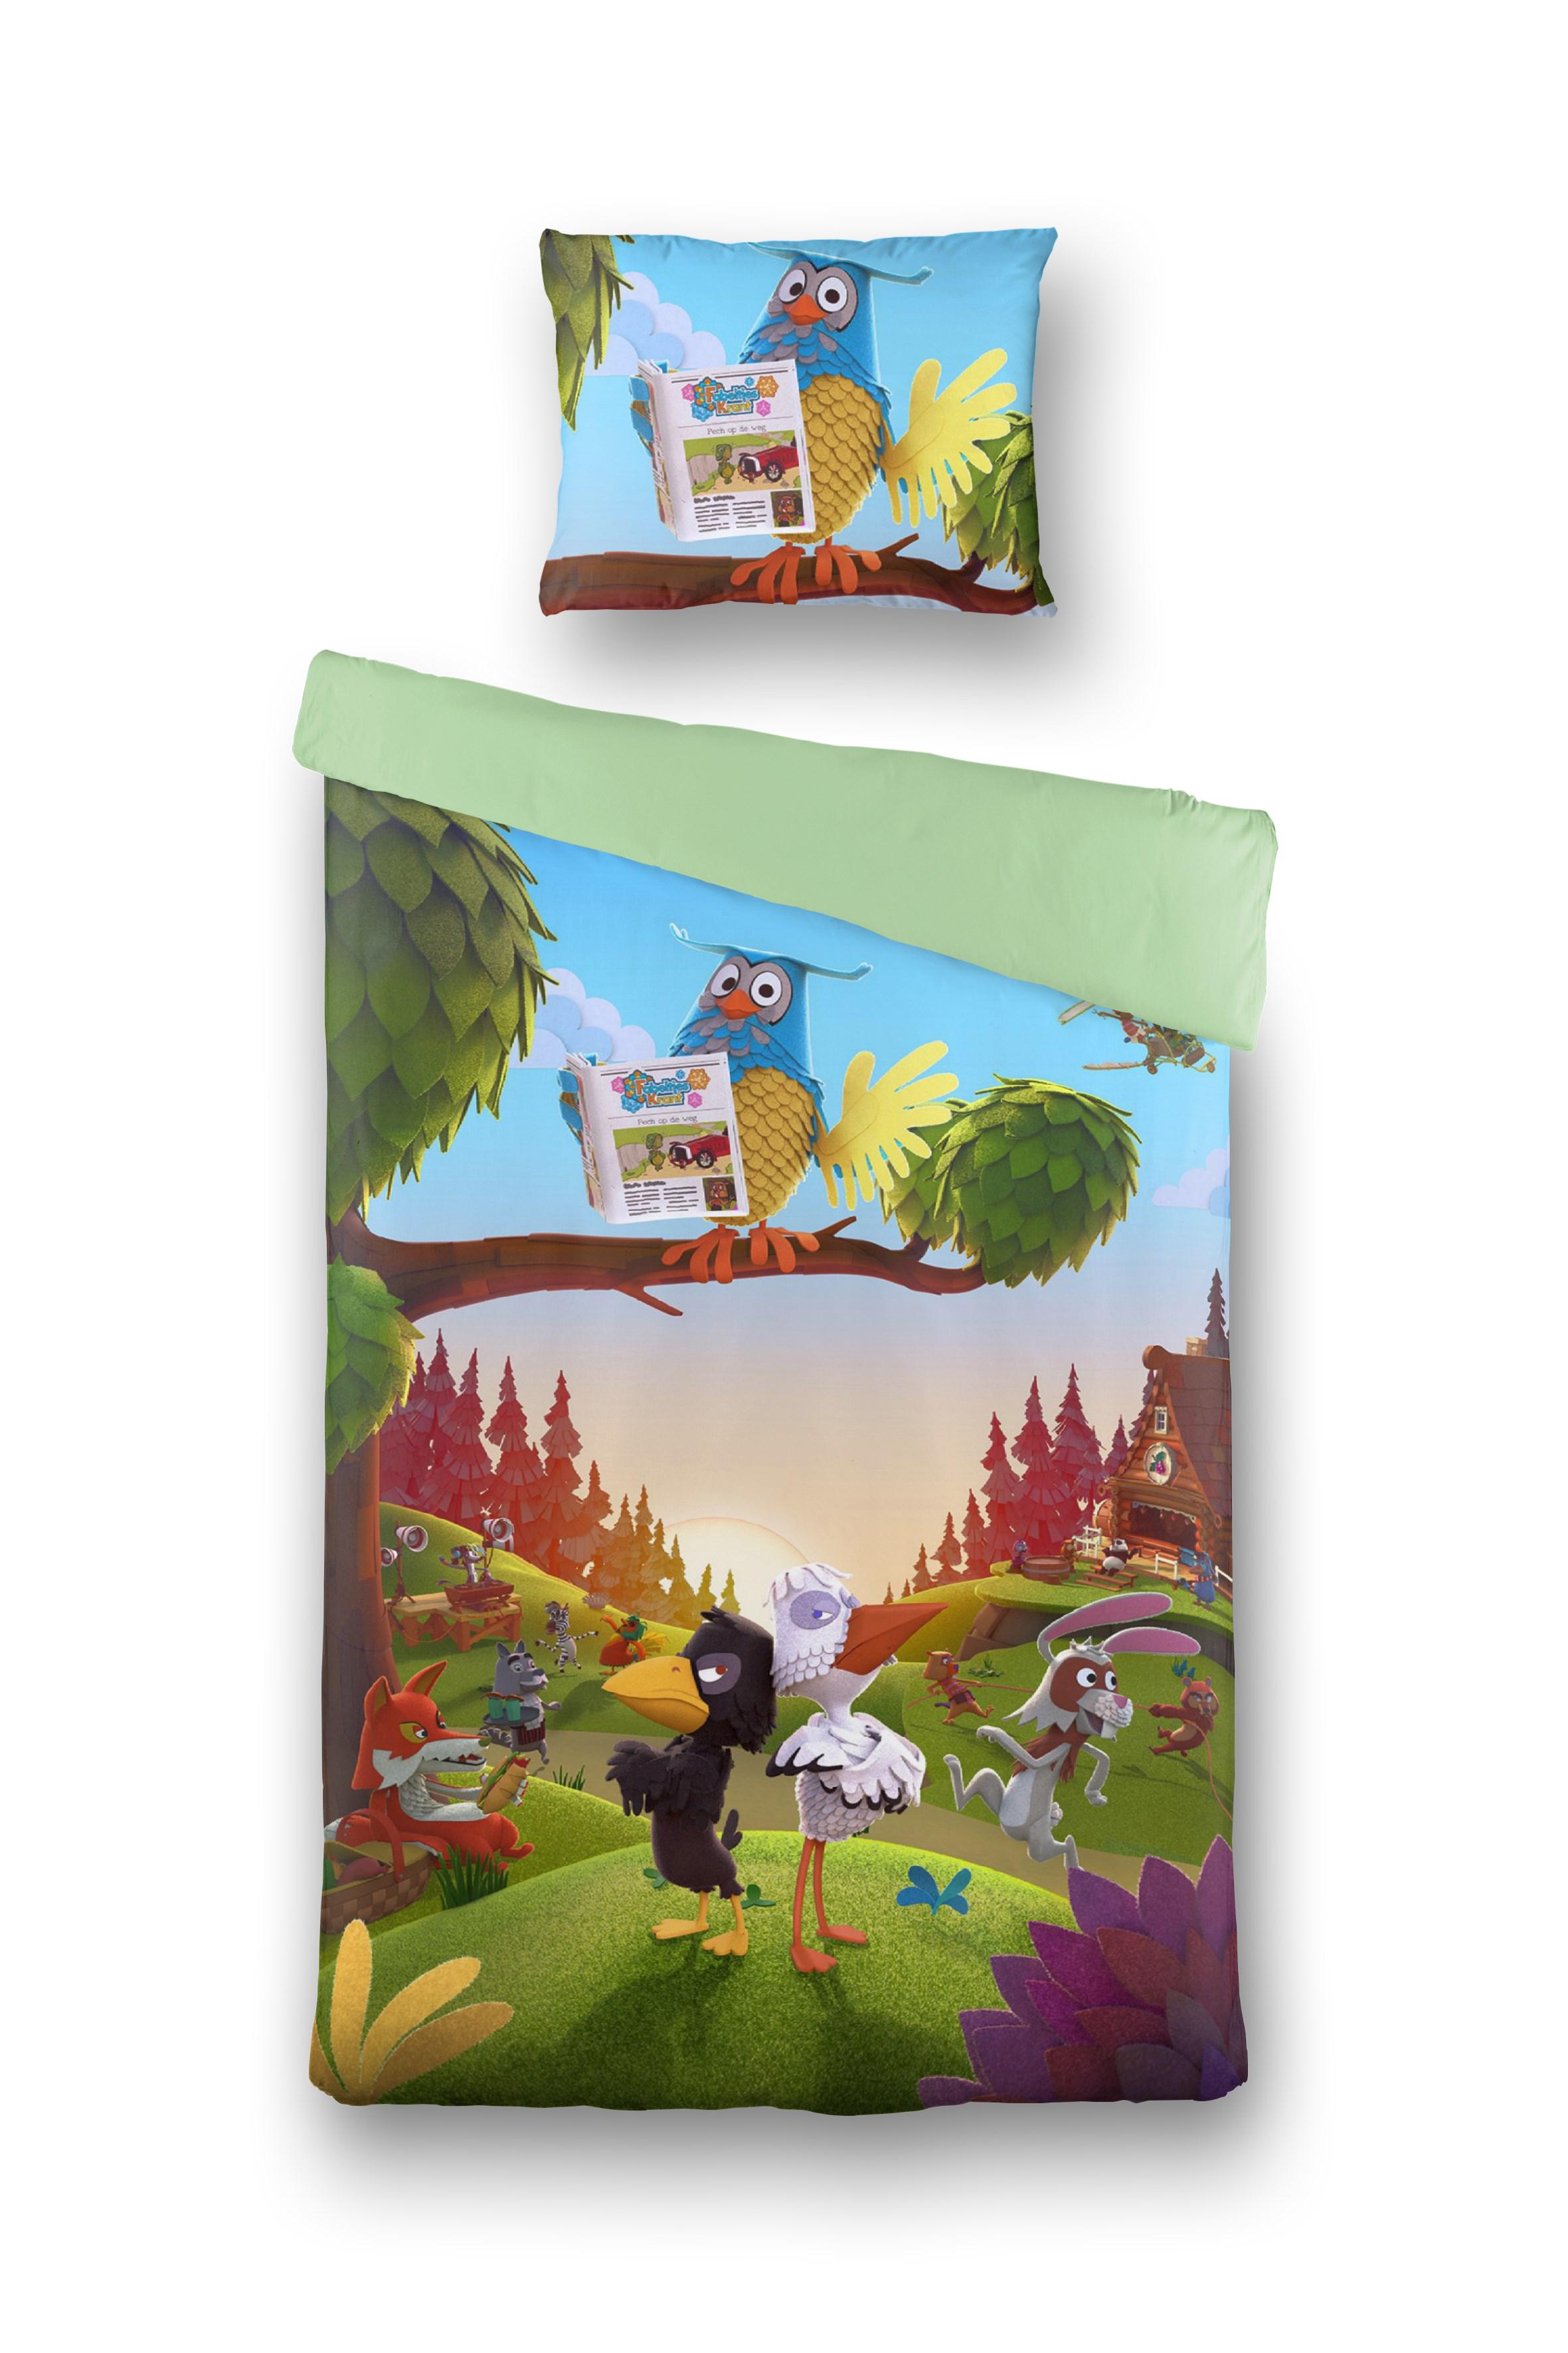 FABELTJESKRANT Dekbed Overtrek Dierenbos Multicolor, 140x200 + 60x70